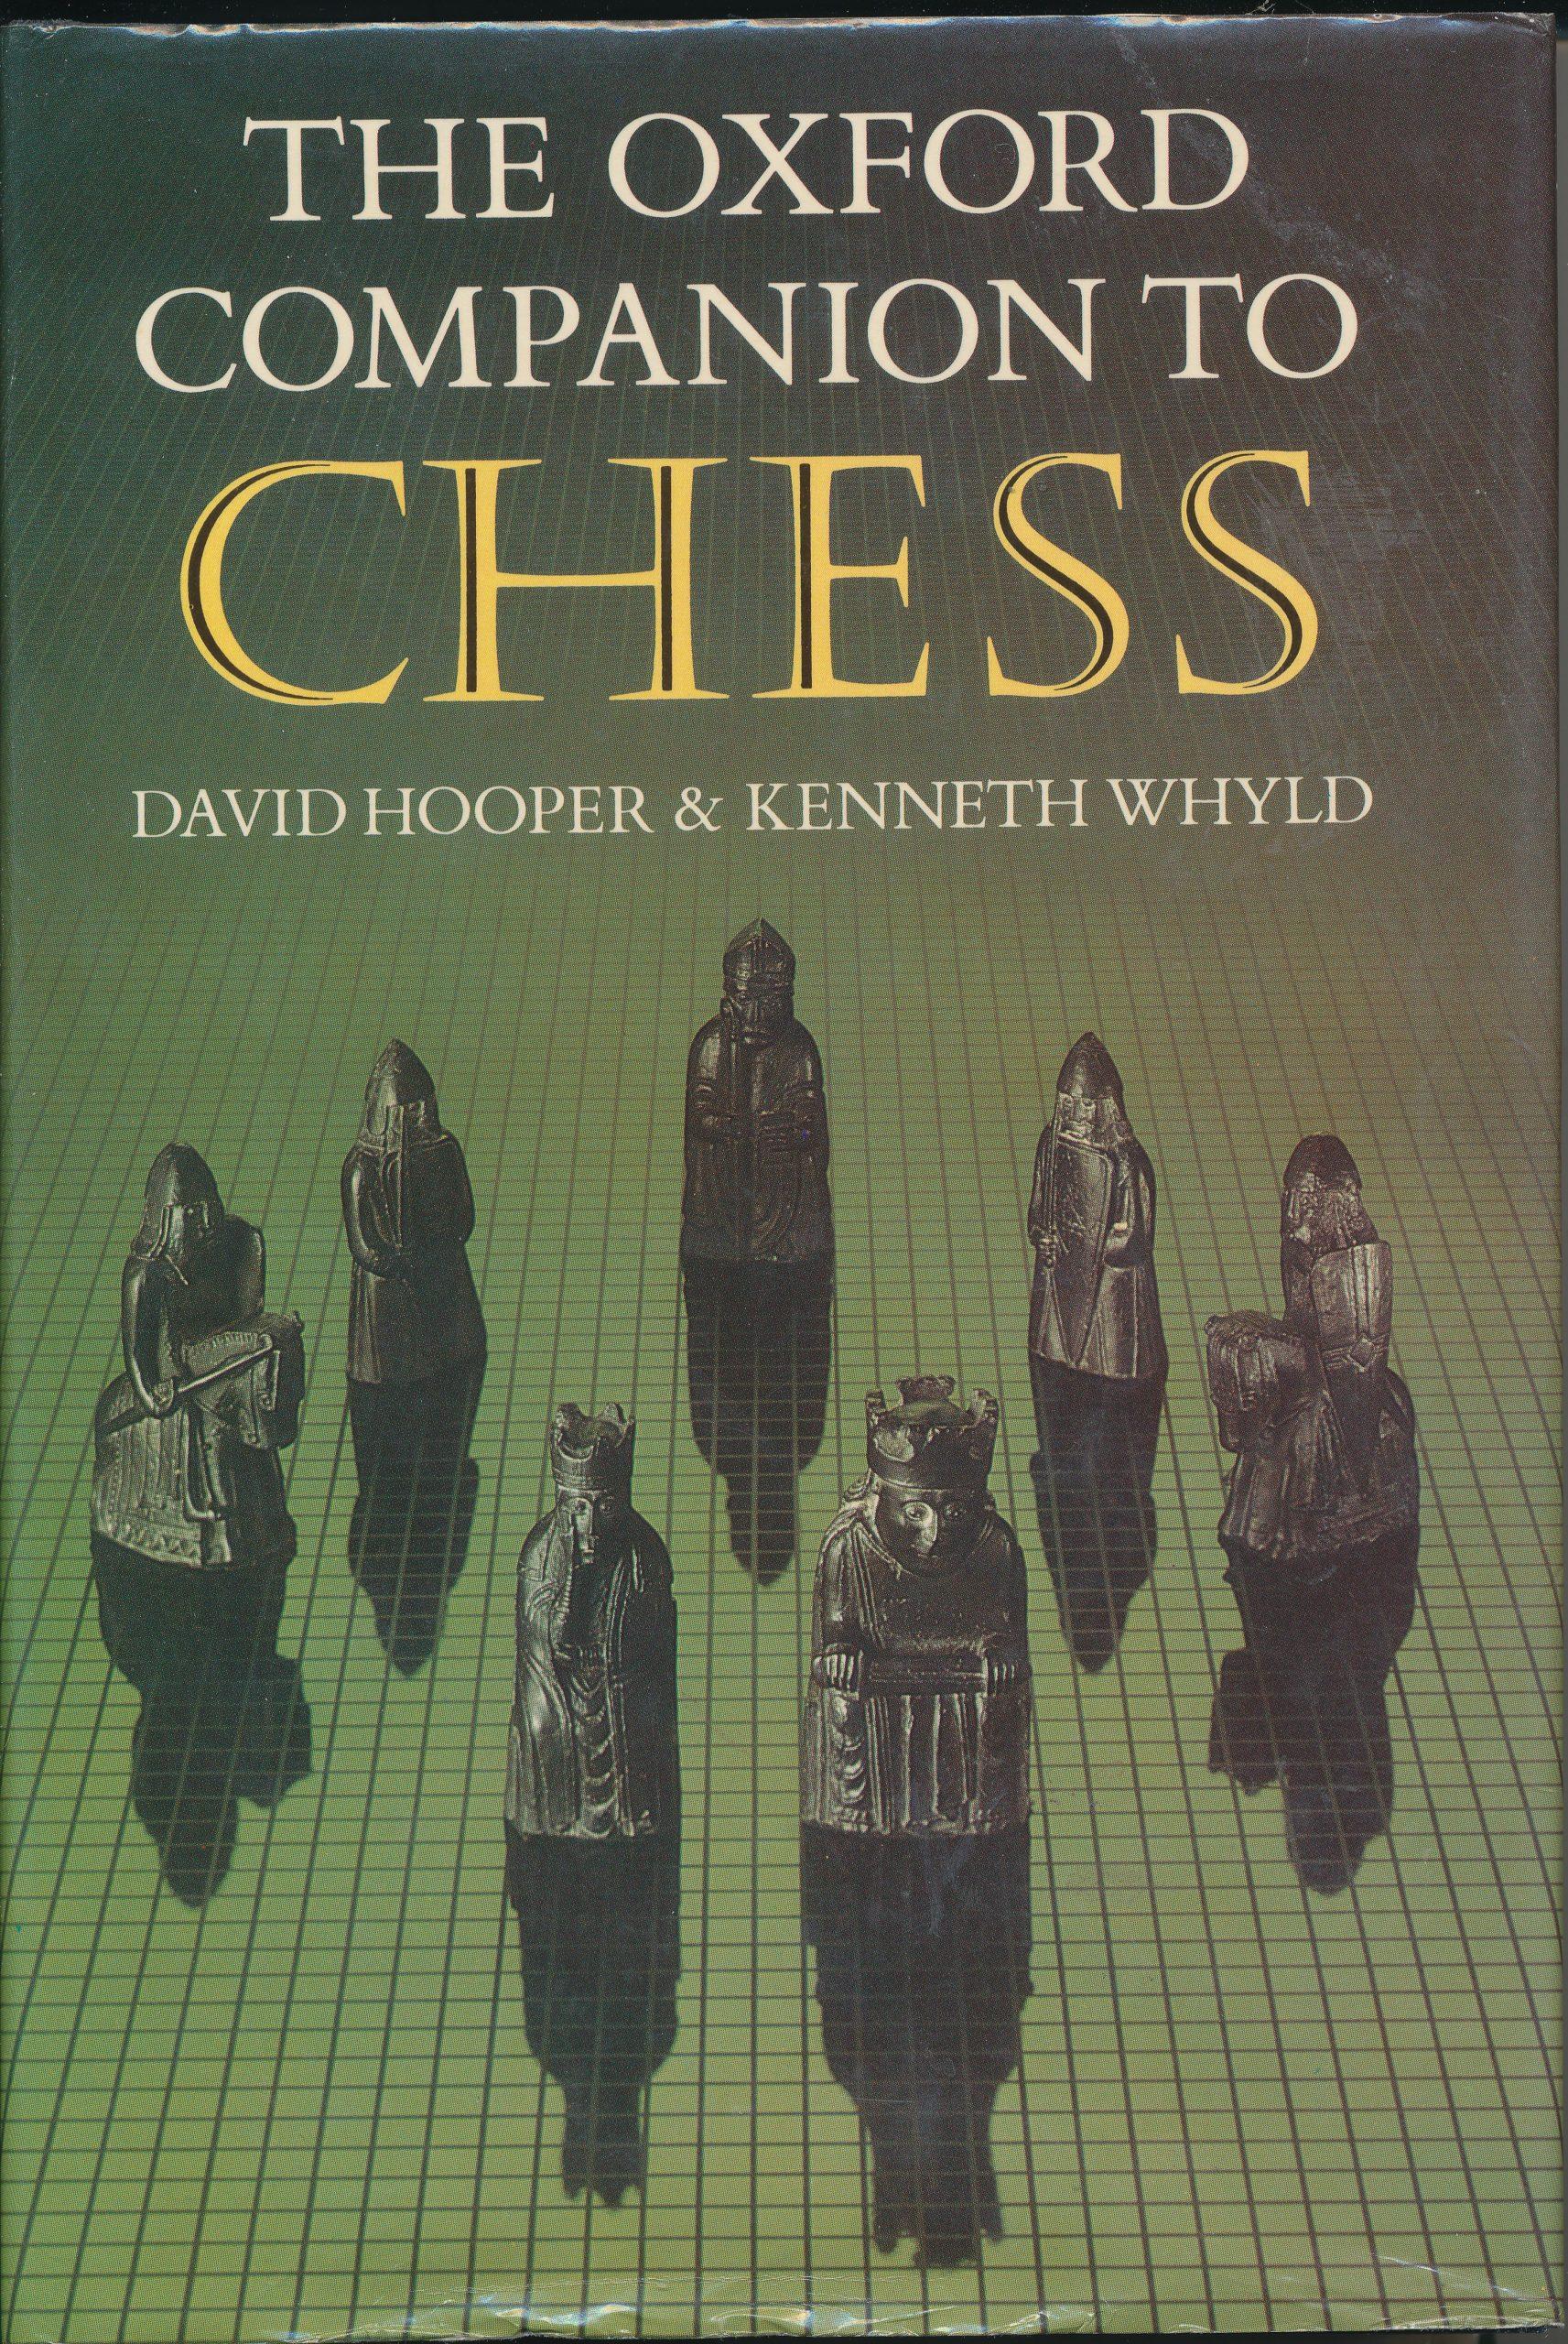 The Oxford Companion to Chess, 1st Edition, David Hooper & Ken Whyld, Oxford University Press, 1984, ISBN 0 19 217540 8